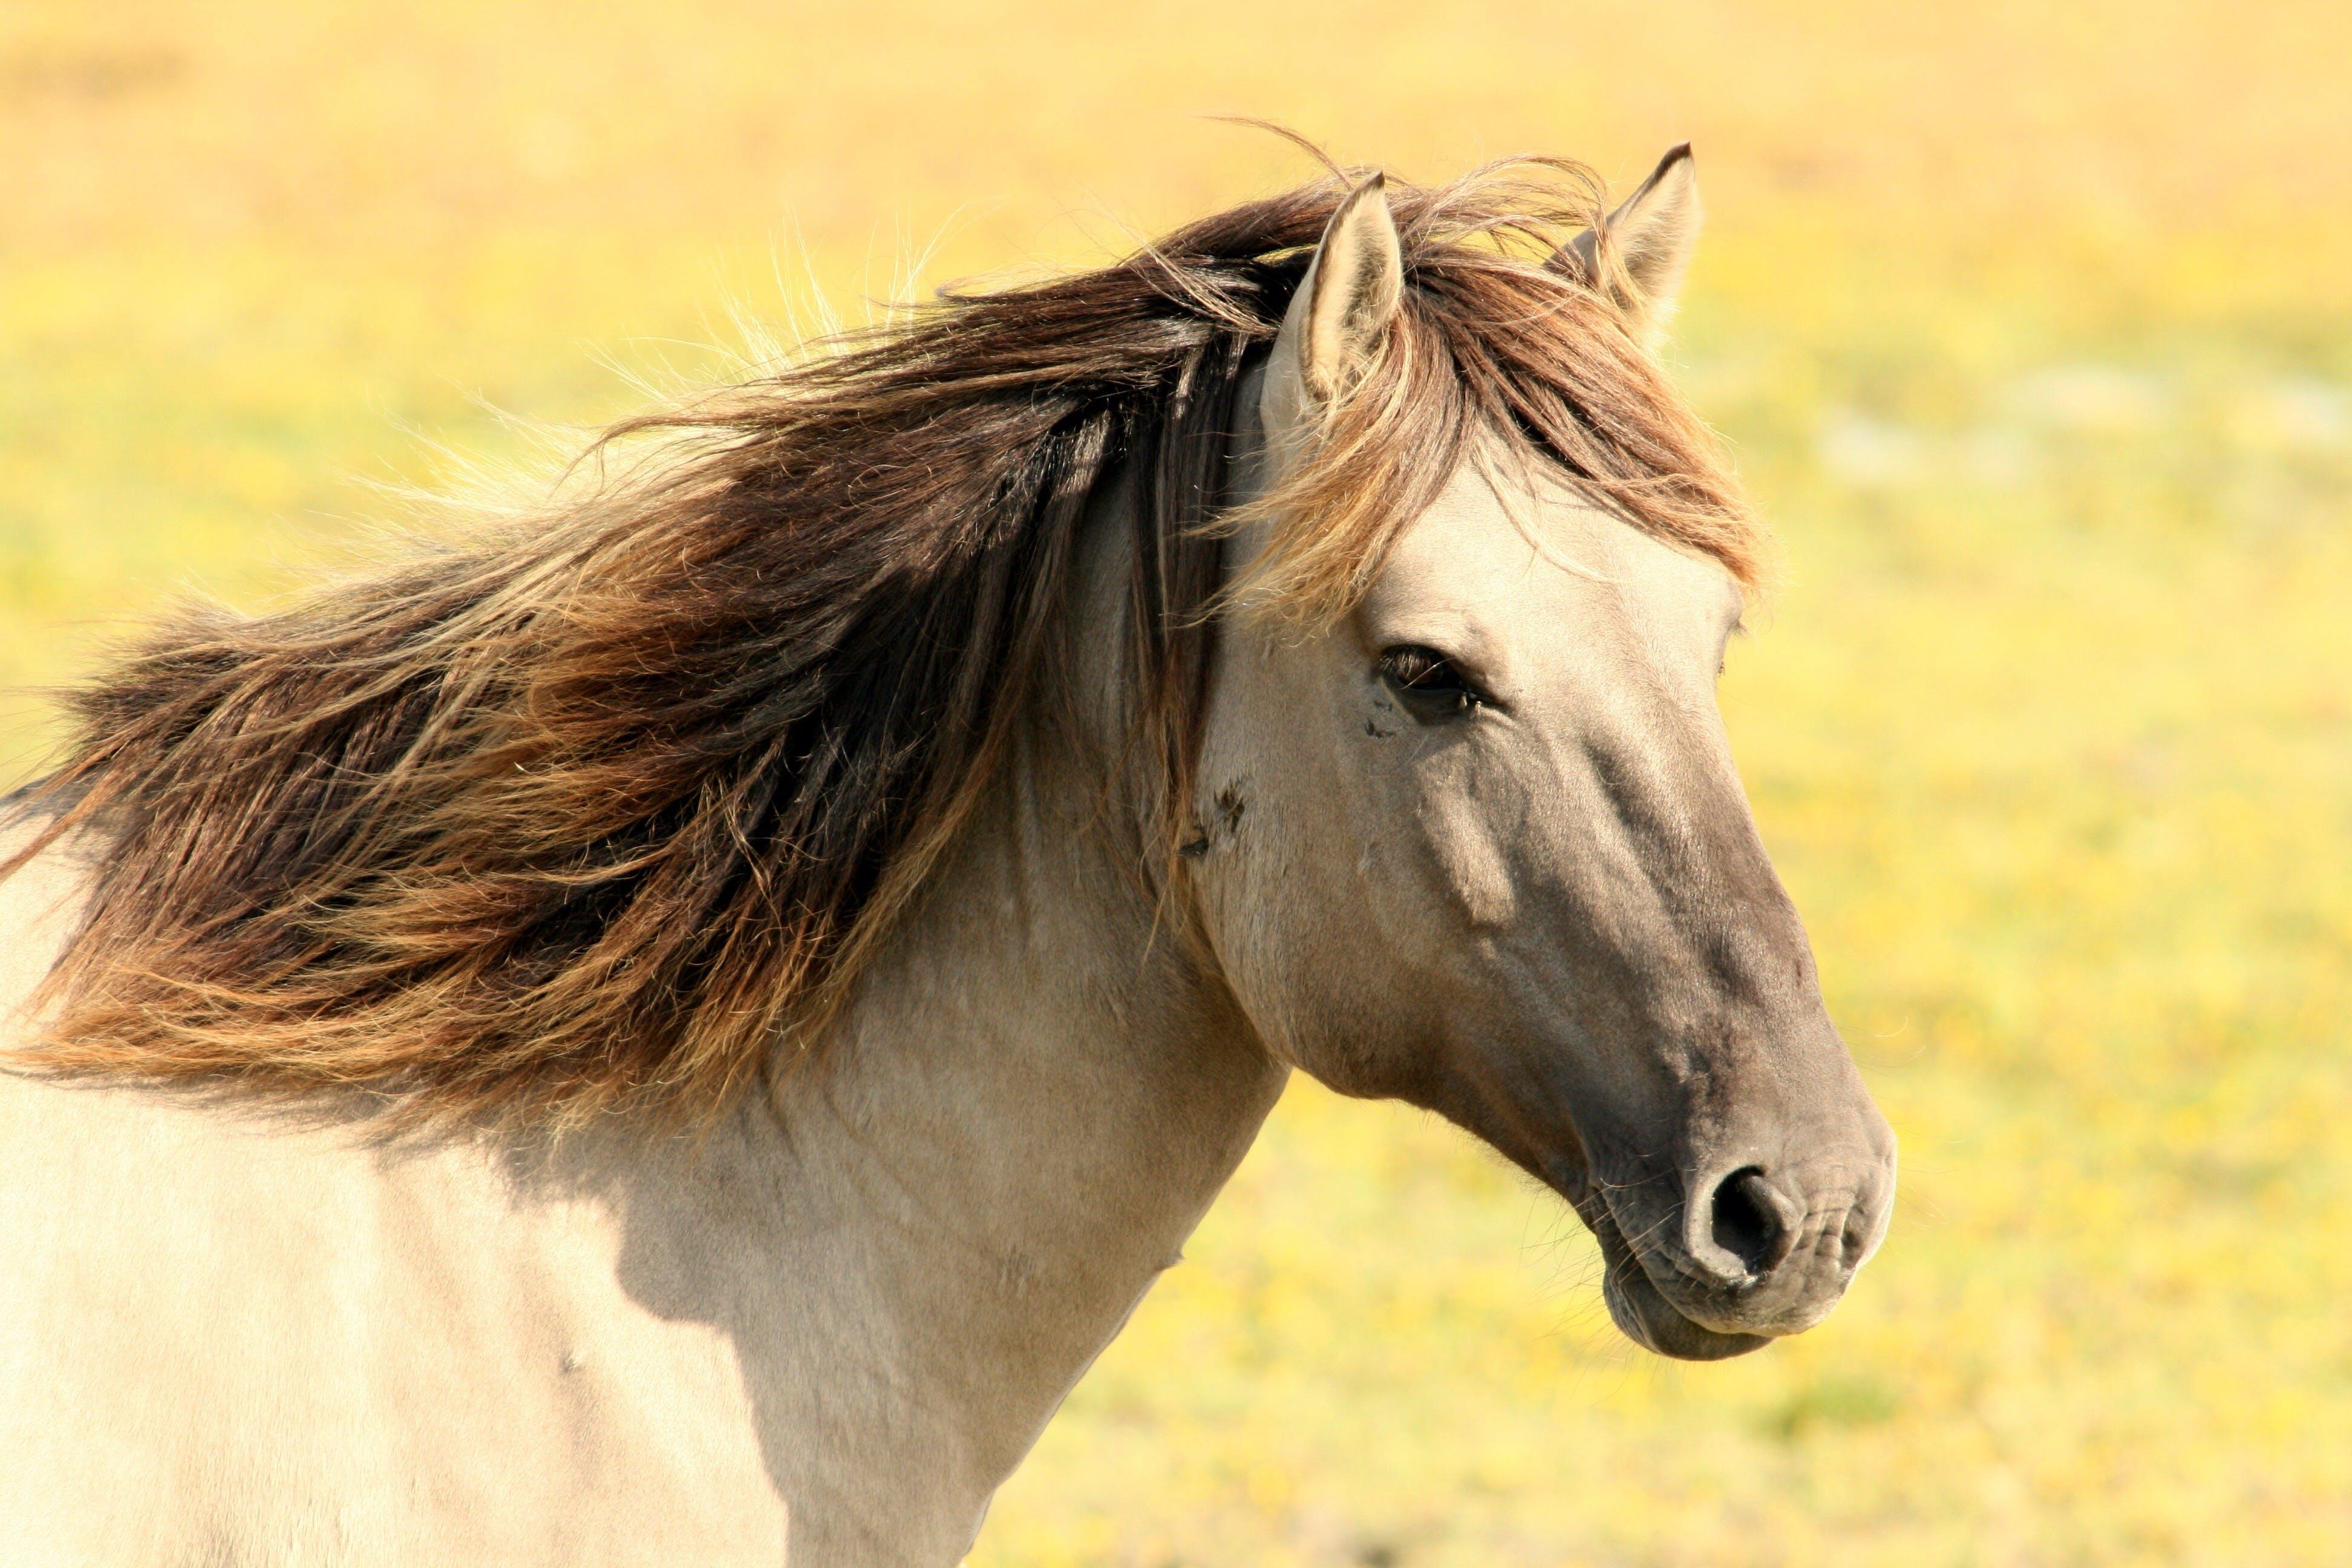 Kostenloses Stock Foto zu pferd, säugetier, tier, weide